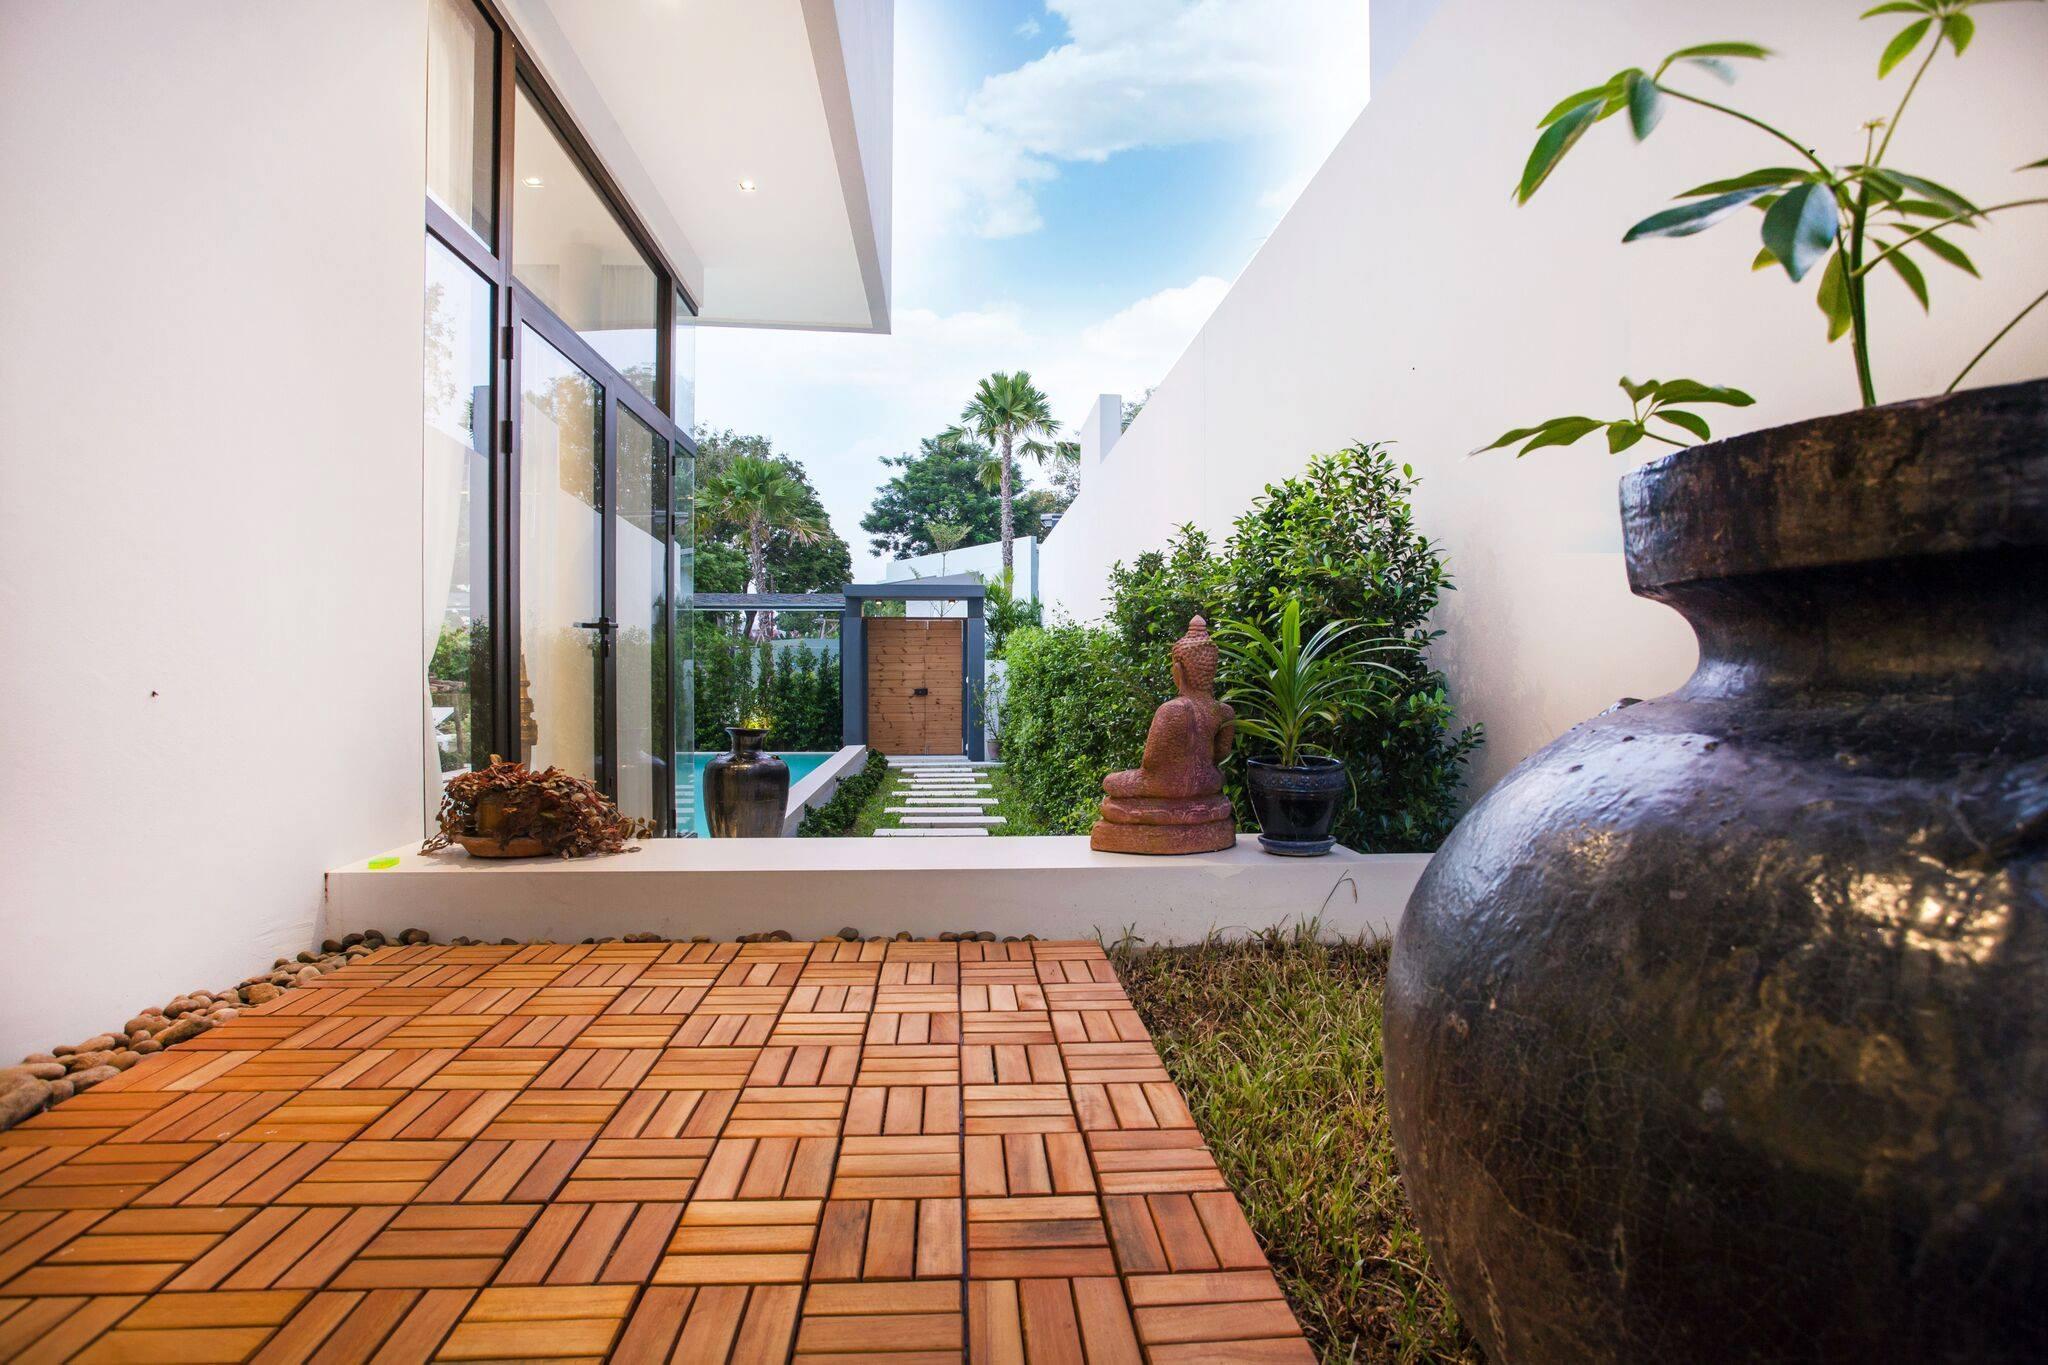 Phuket Real Estate Agency – Nai Harn Beach (39)